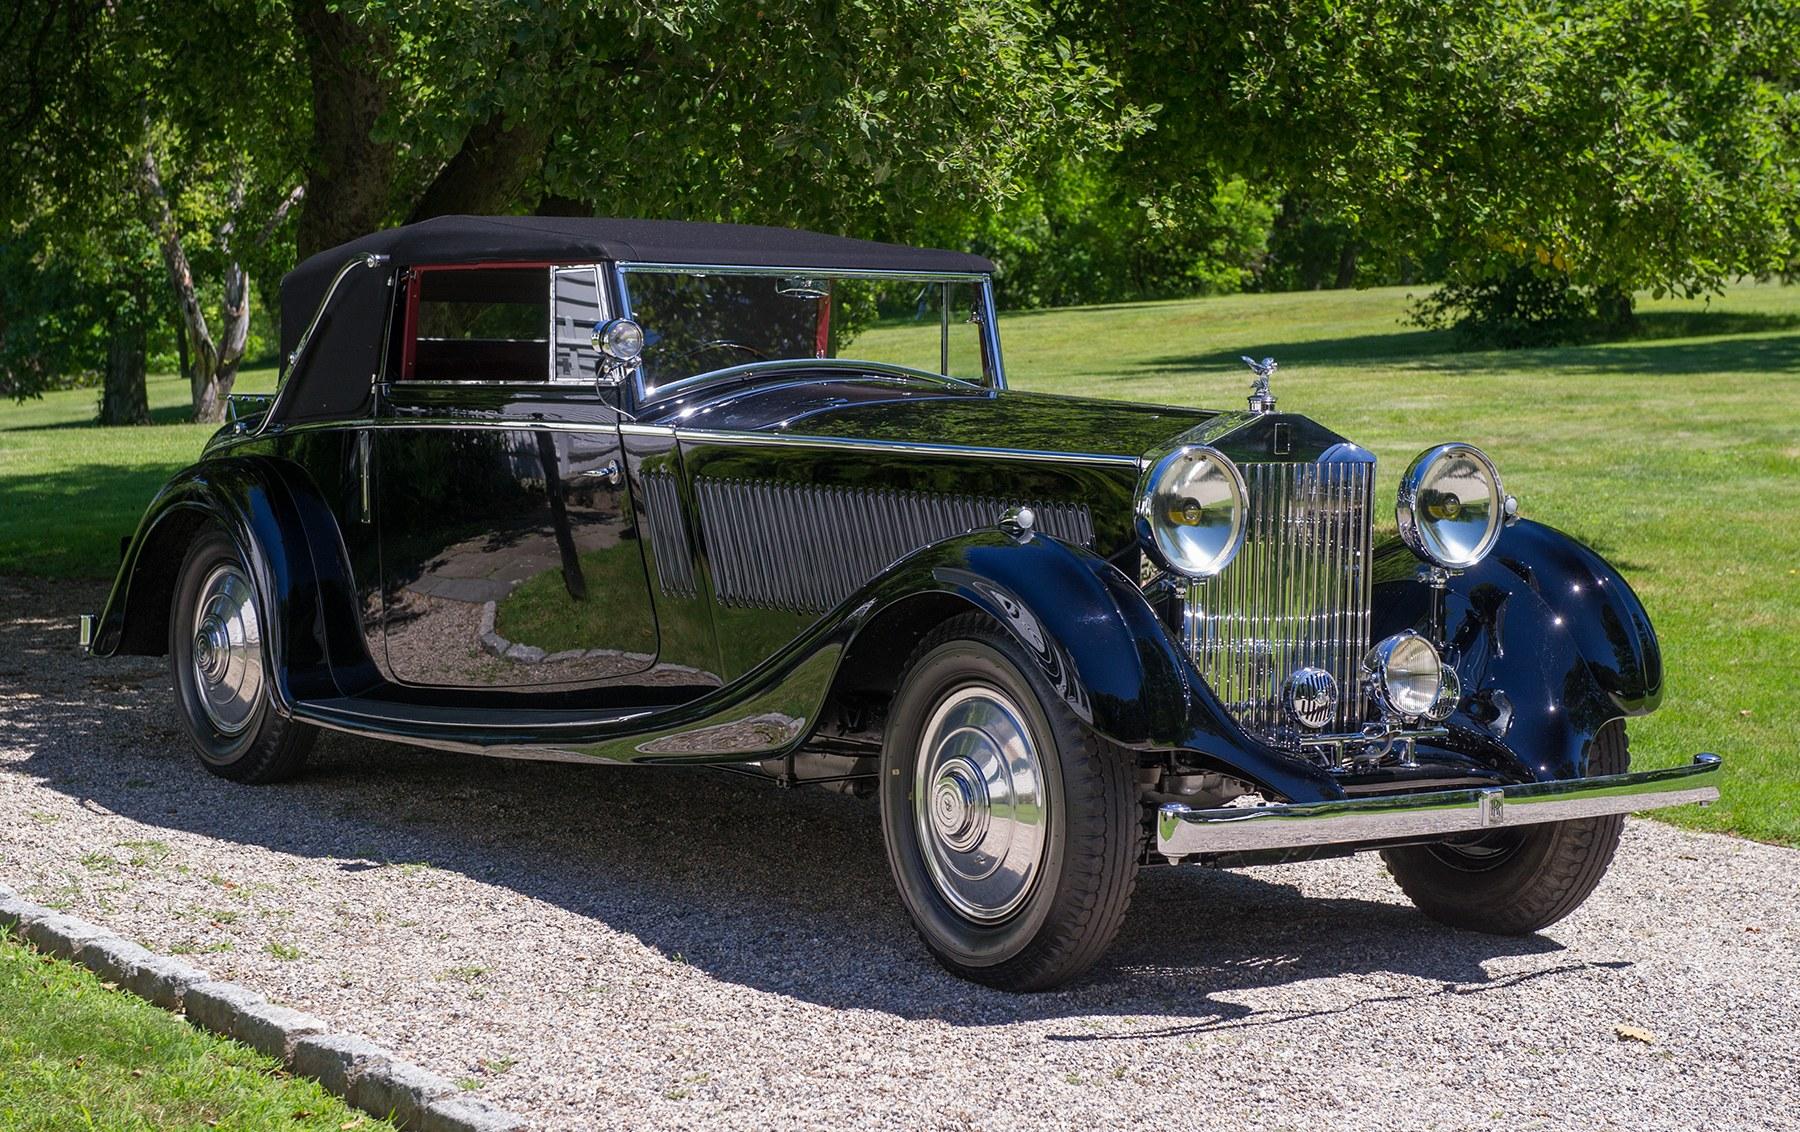 1935 Rolls-Royce Phantom ll Drop Head Coupe